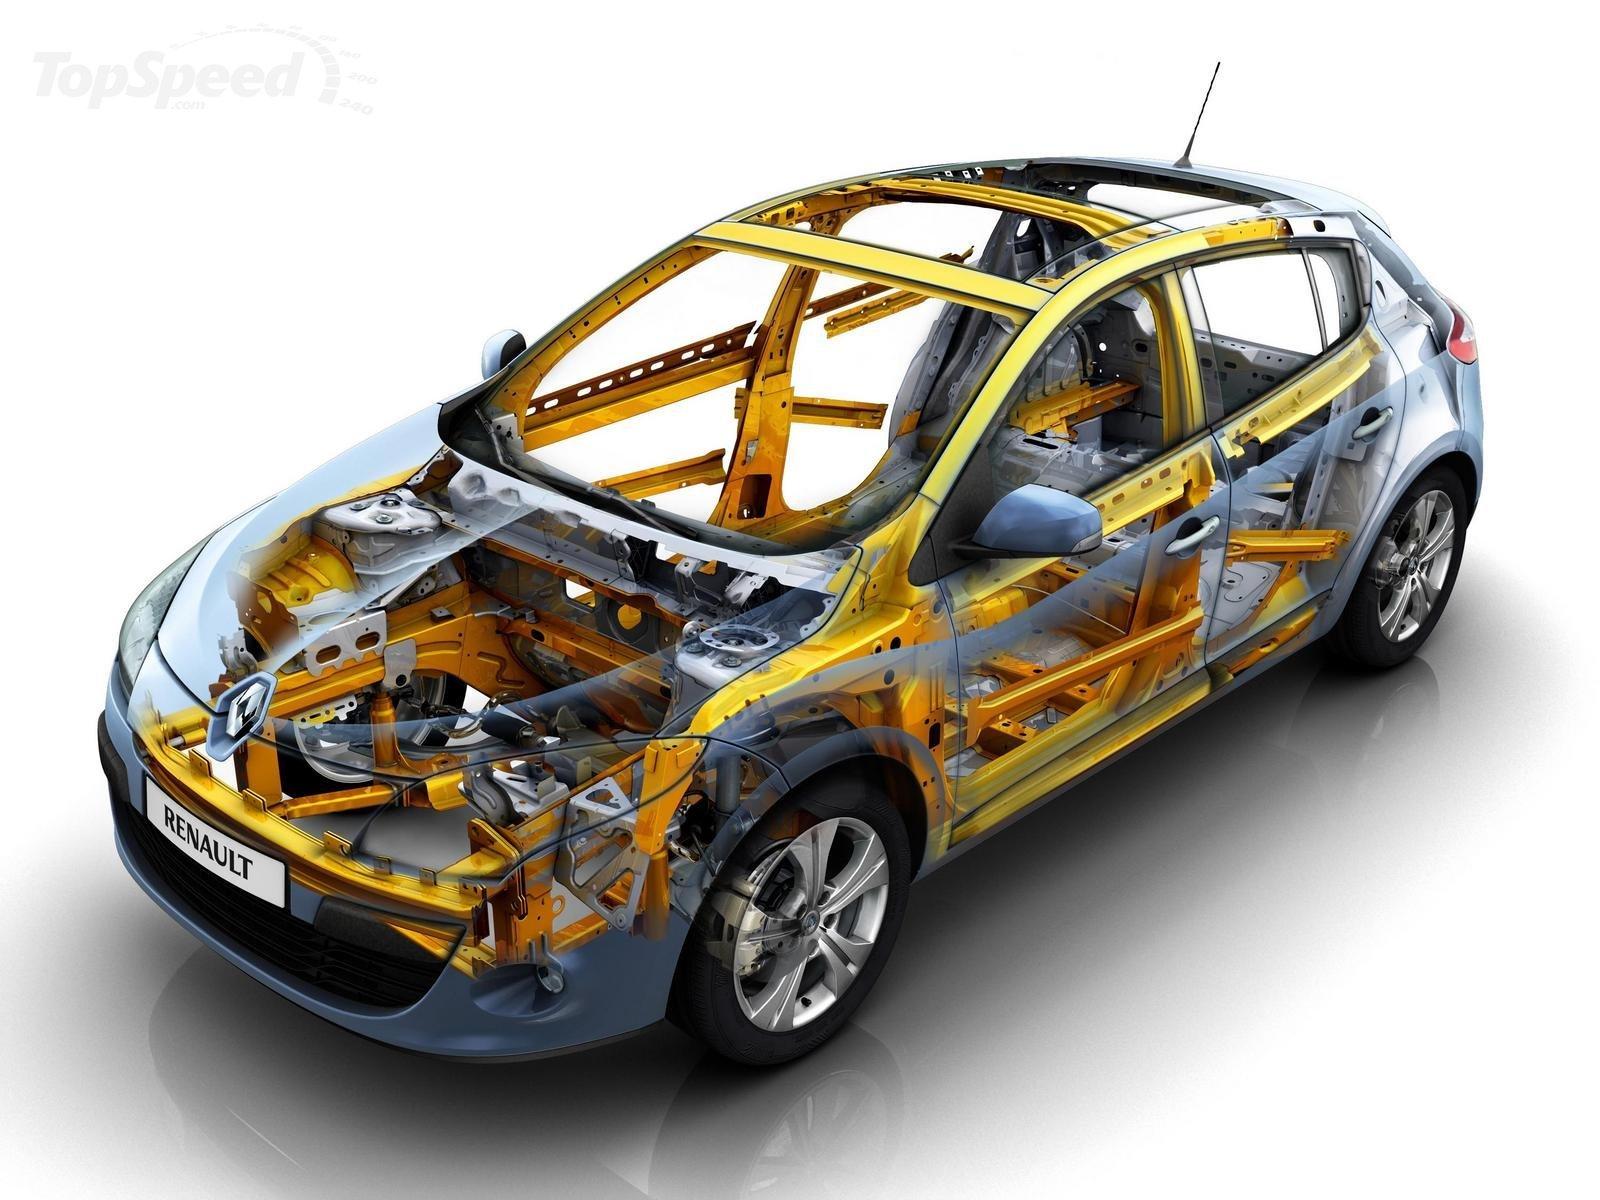 Renault Megane Body Structures Boron Extrication